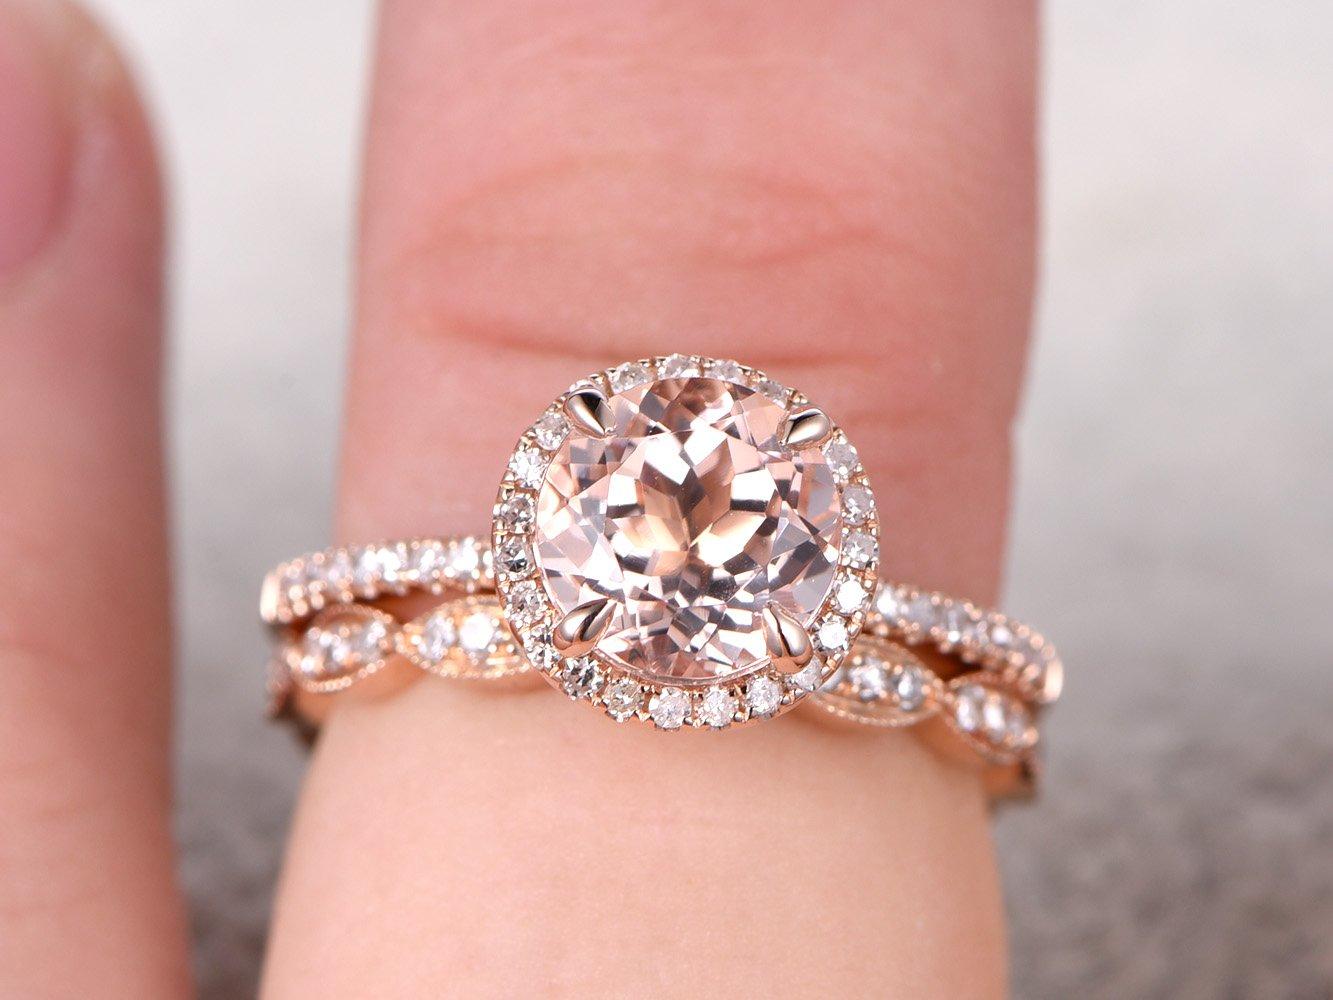 Amazon.com: 2 Solid 14k Rose Gold Wedding Rings Set,7x7mm Natural ...